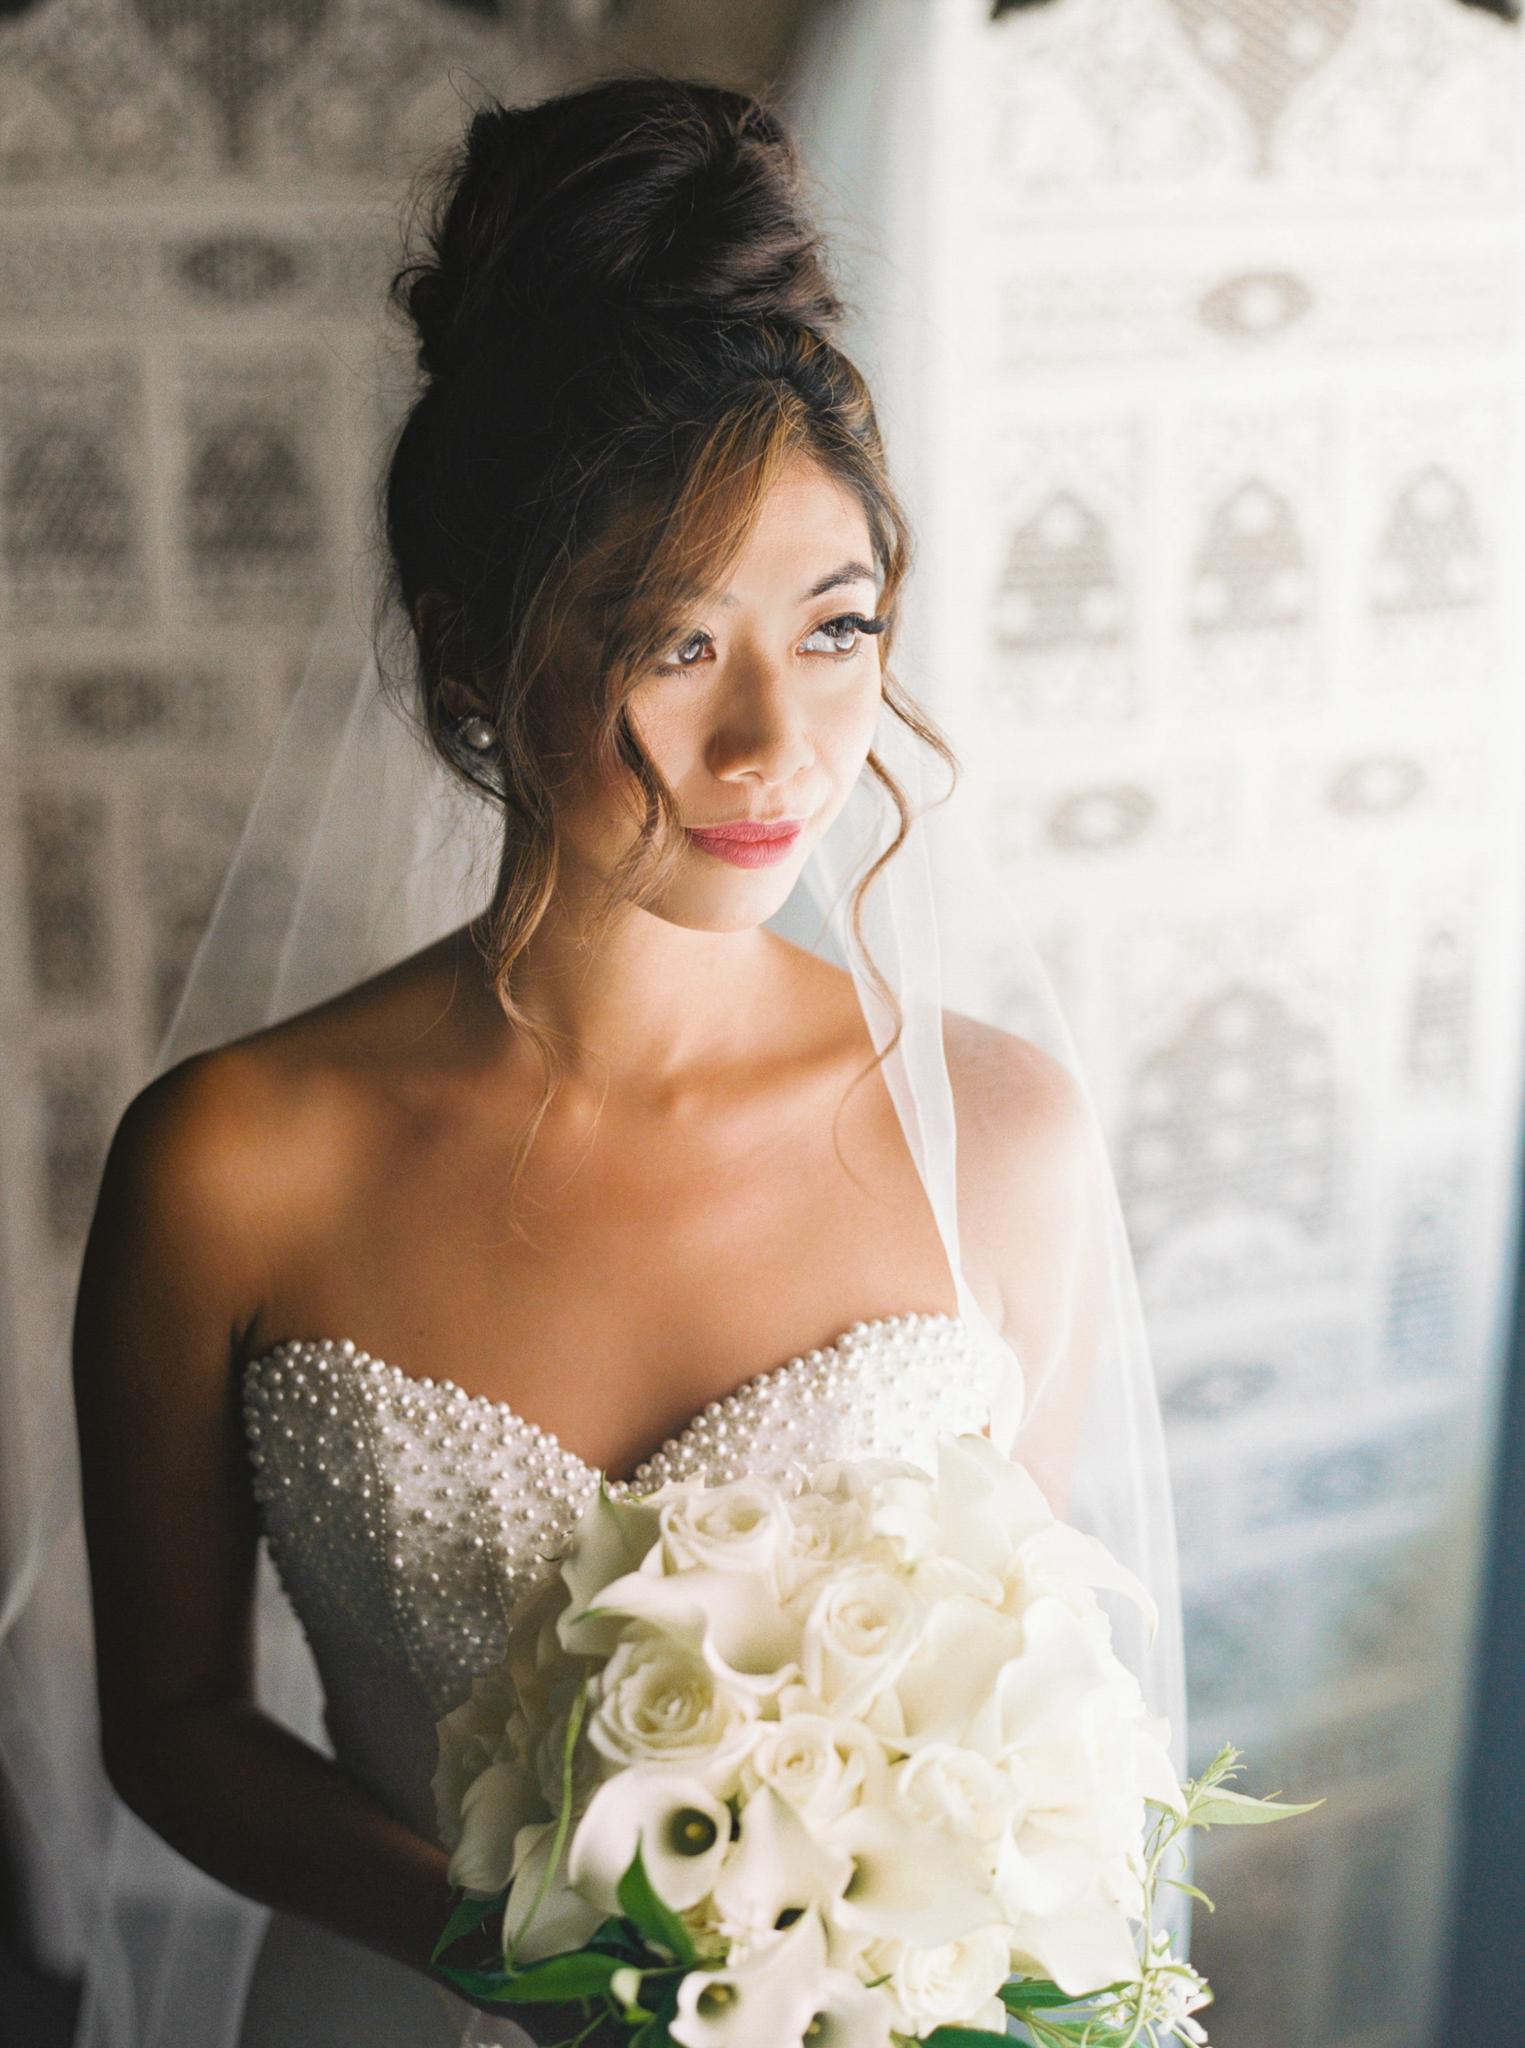 016OutliveCreative_Travel_Photographer_Videographer_Lewis&Clark_Oregon_Elegant_BlackTie_Destination_Wedding.jpg